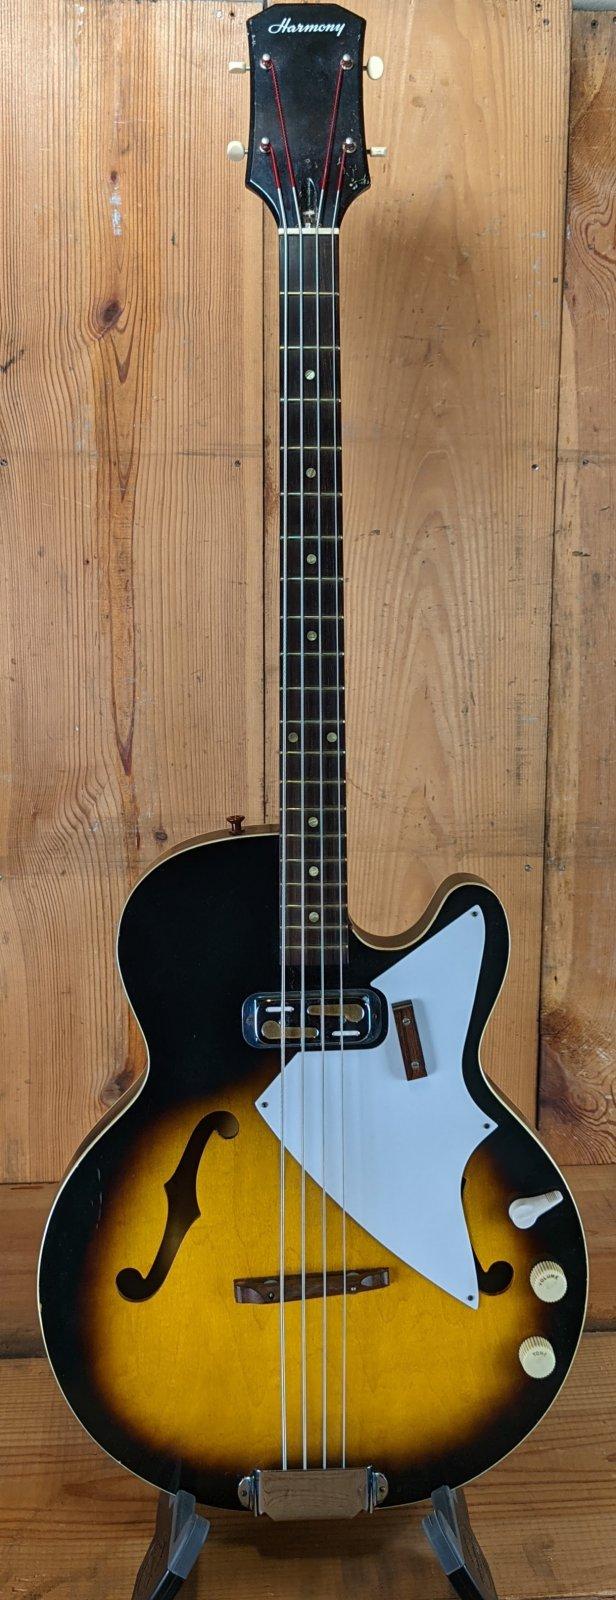 1962 Harmony H22 Hollowbody Electric Bass